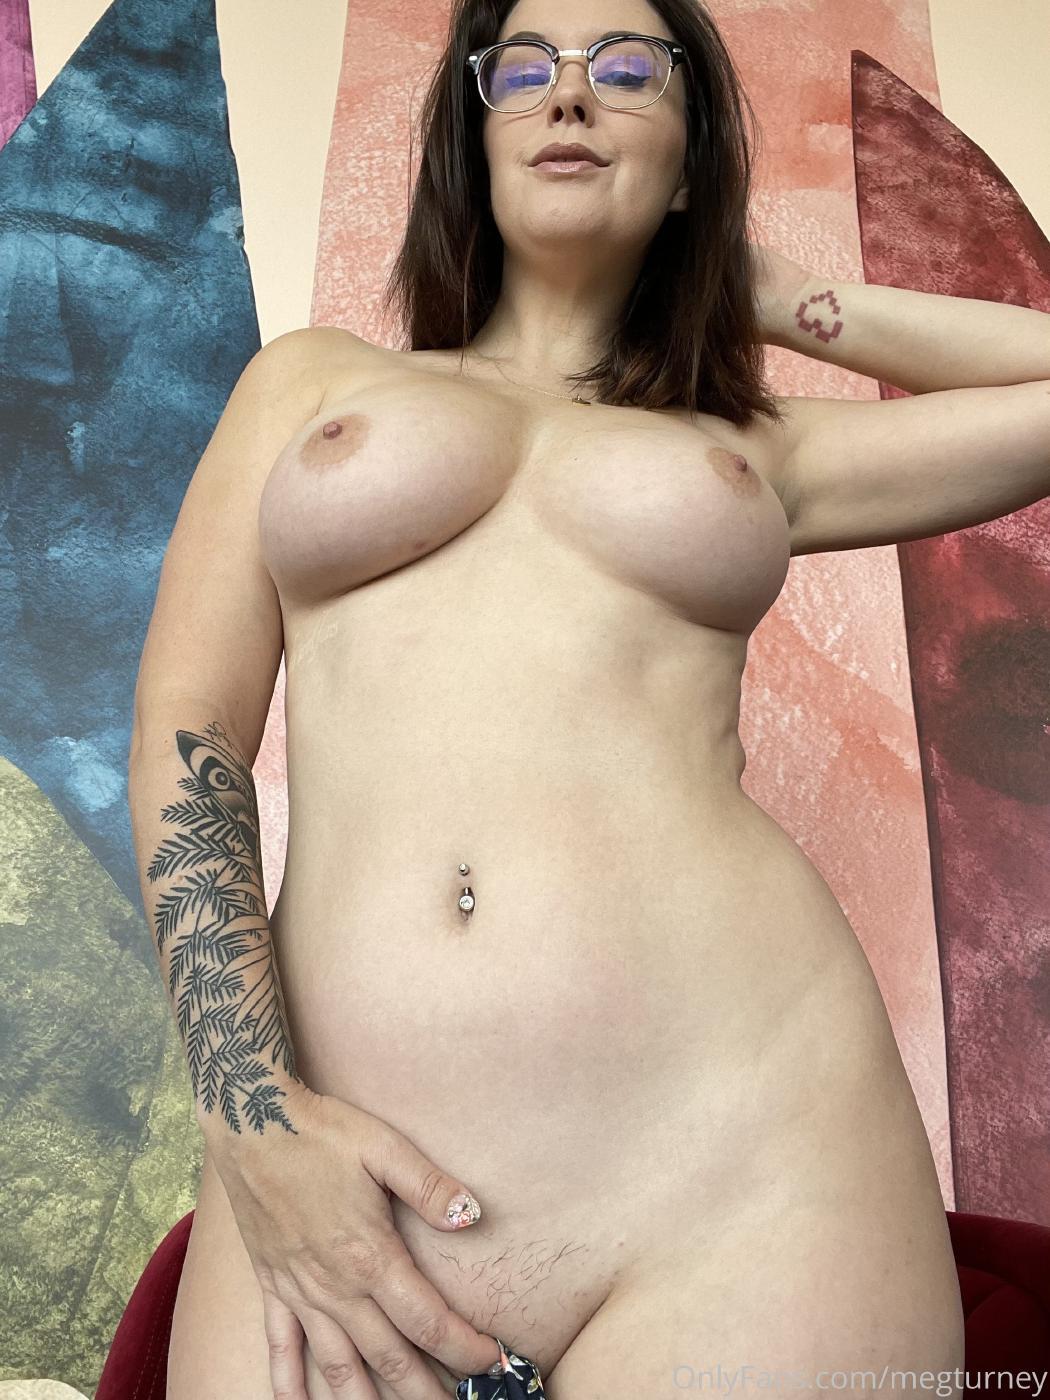 Meg Turney Unshaven Pussy Candids Onlyfans Set Leaked Cbtwug